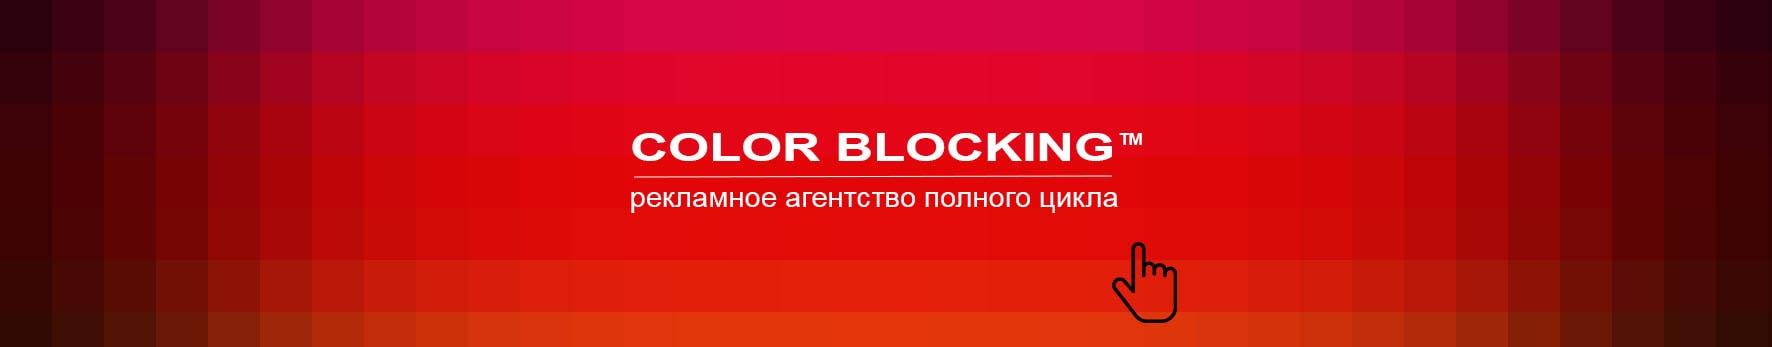 Реклама на телеканале ТНТ РСО-Алания агентство